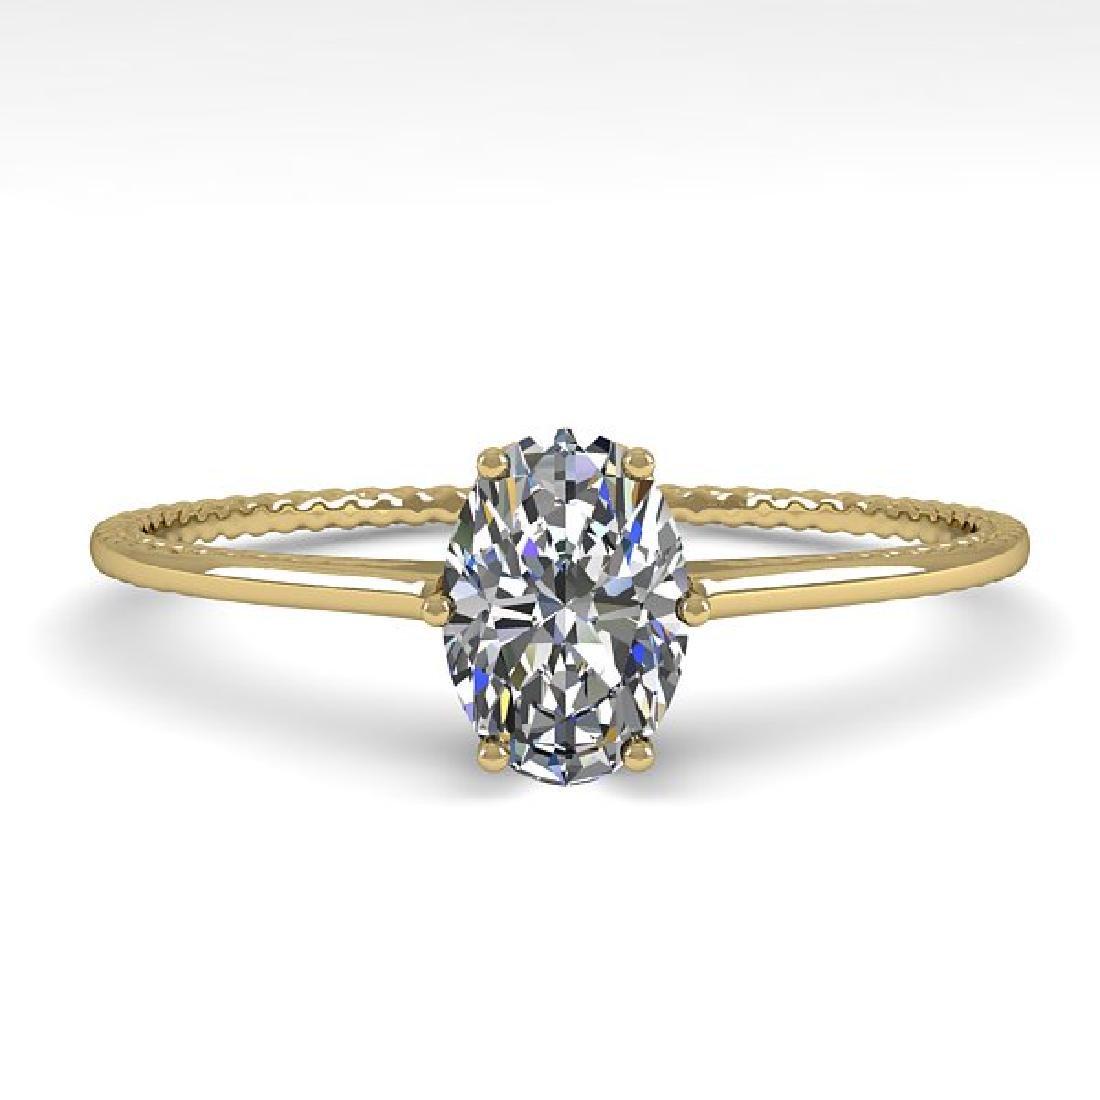 1.0 CTW VS/SI Oval Cut Diamond Art Deco Ring 14K Yellow